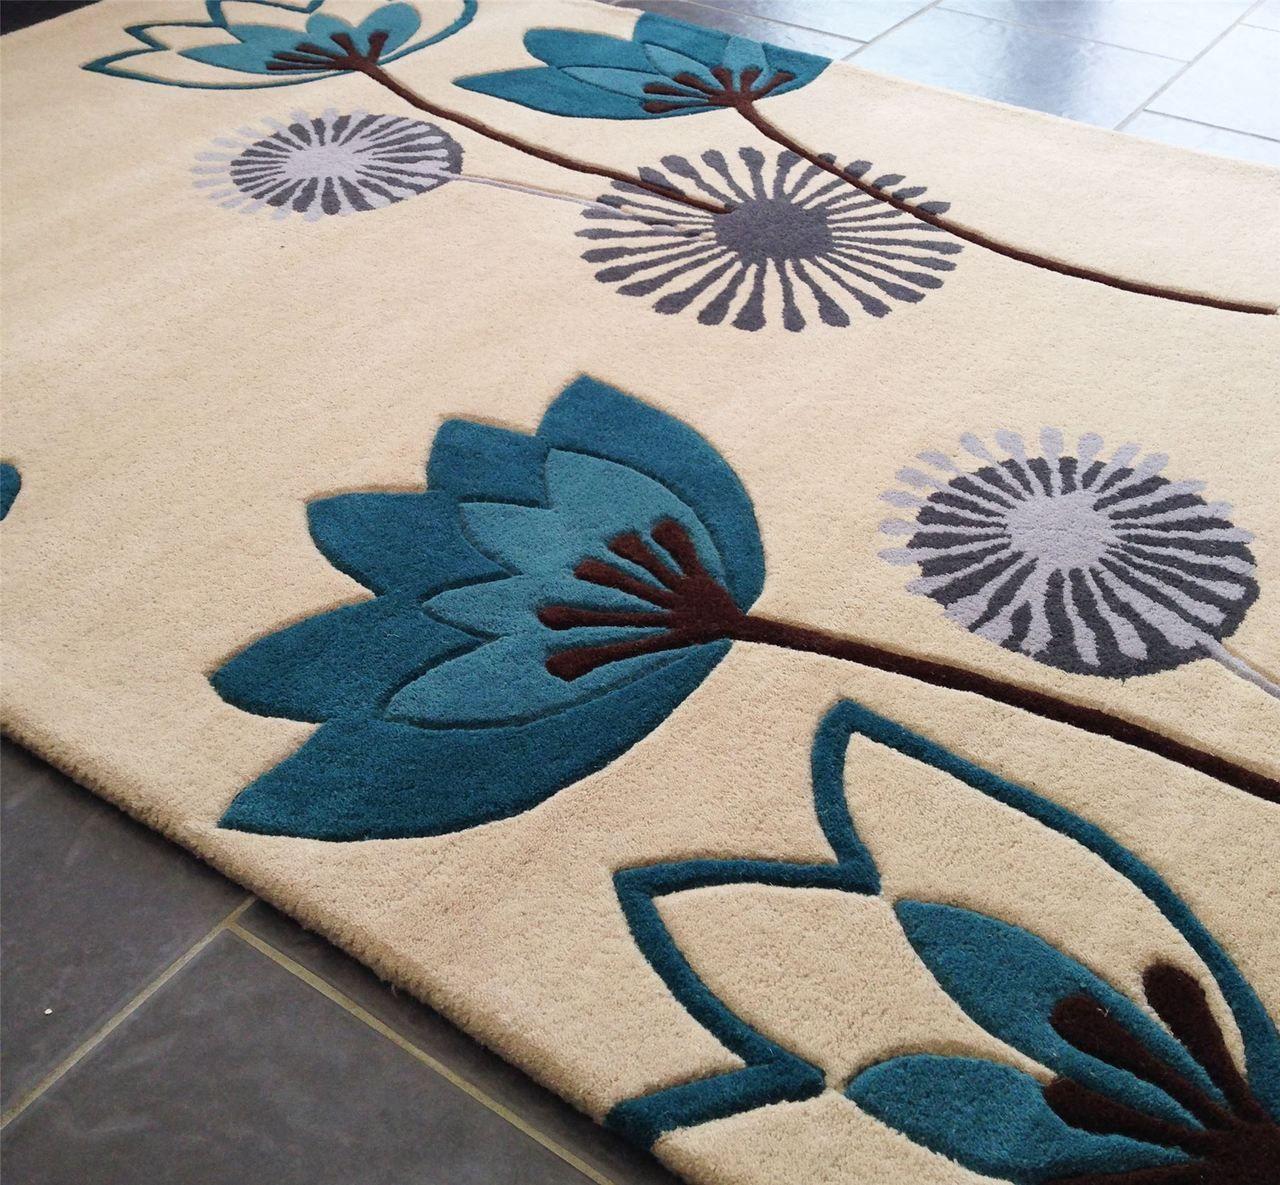 floral art etiquette beige teal rug  modern style rugs  gorgeous  - floral art etiquette beige teal rug  modern style rugs